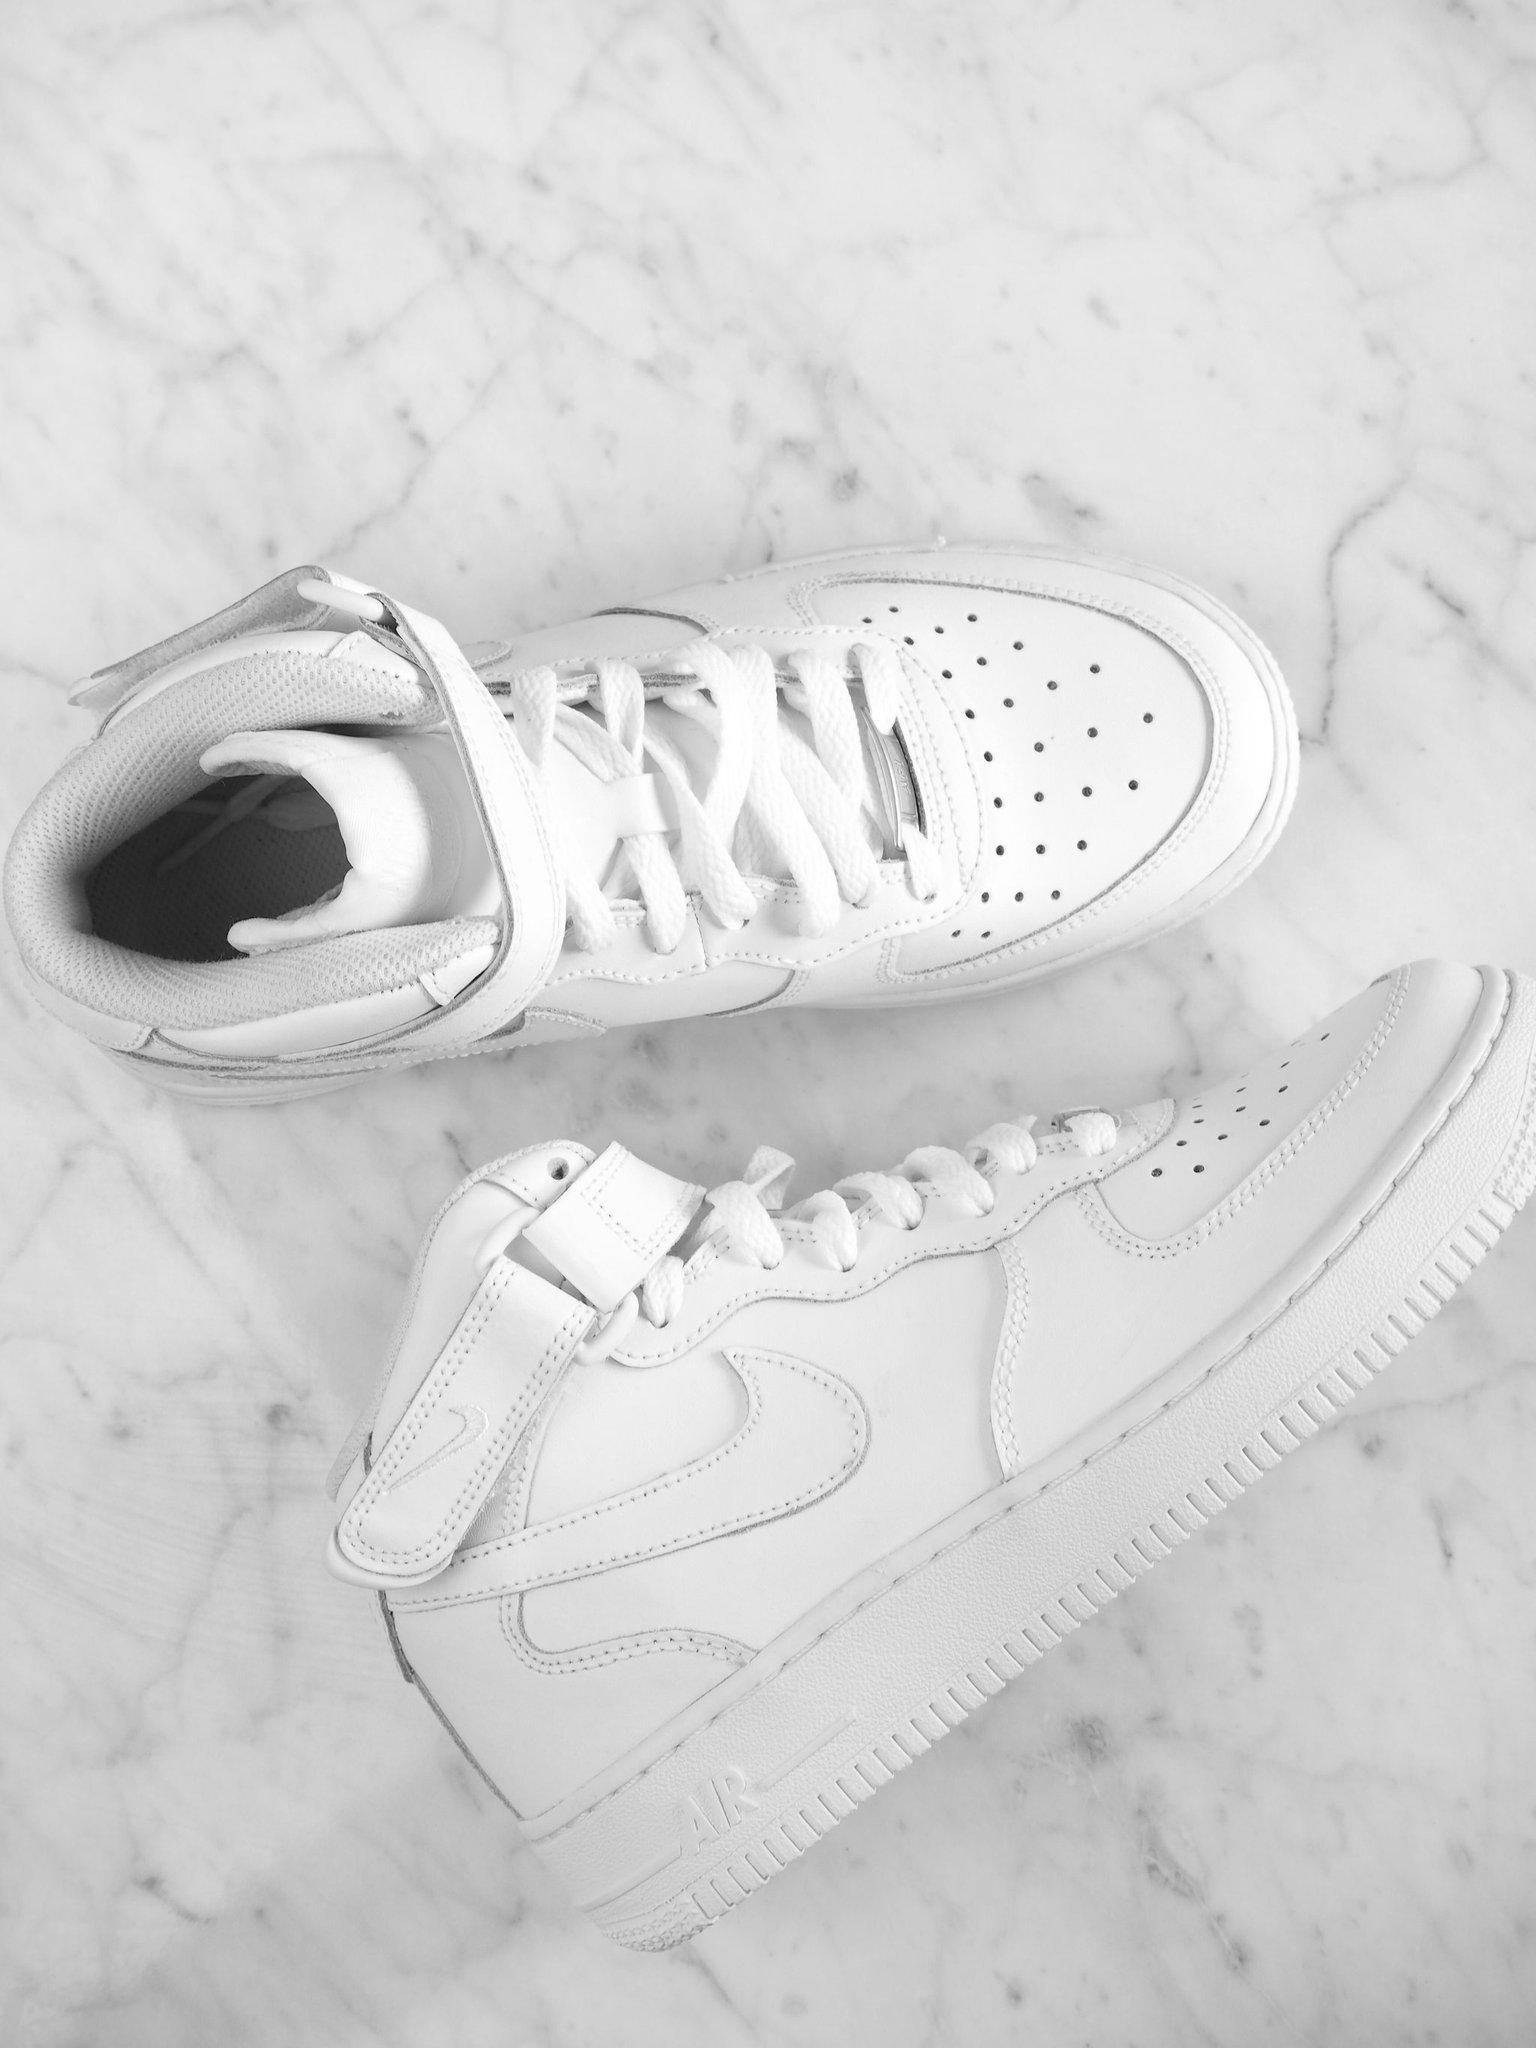 grossiste a3ee0 35b4e Nike air force 1 sneakers Zalando (345940770) ᐈ Köp på Tradera